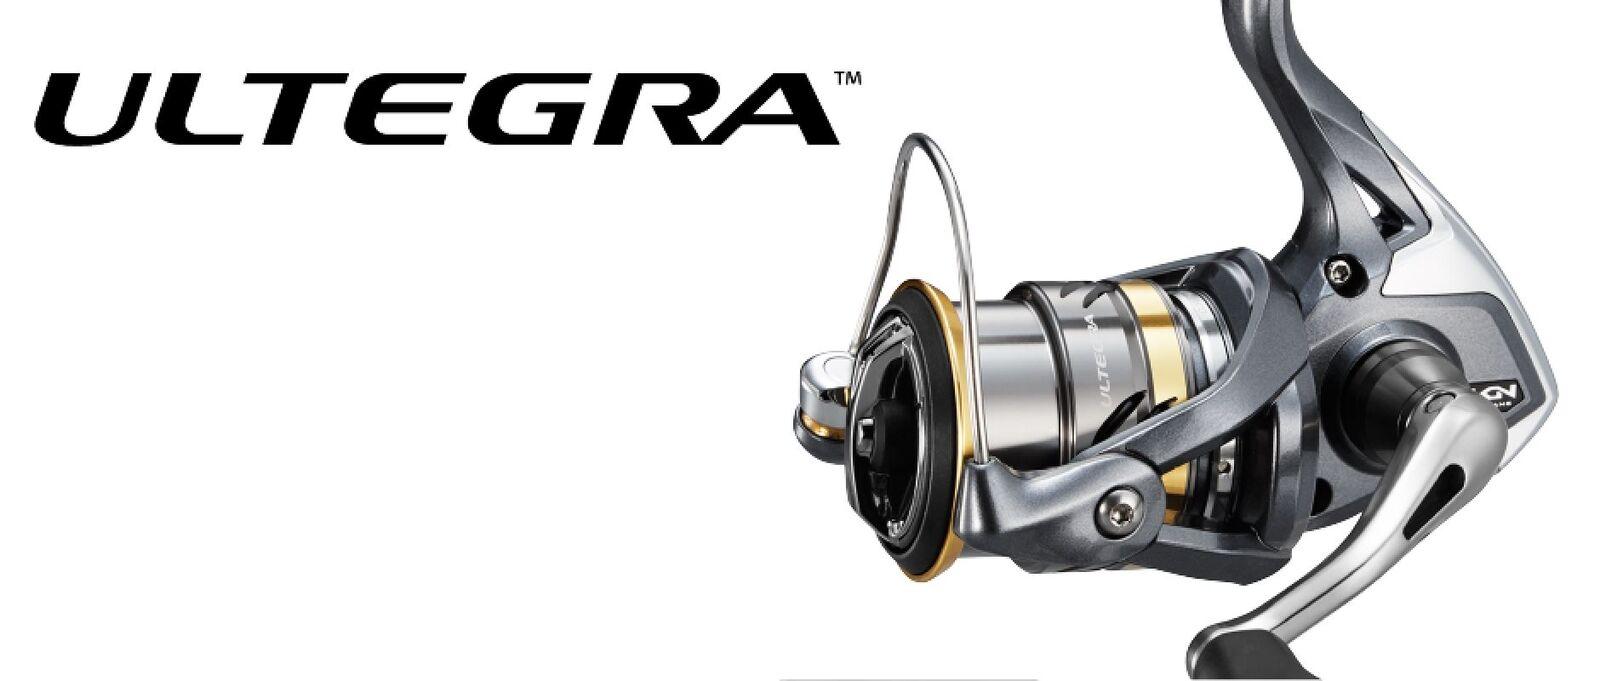 Shimano Ultegra FB Compact Front Drag Fishing Spinning Reel Various Models